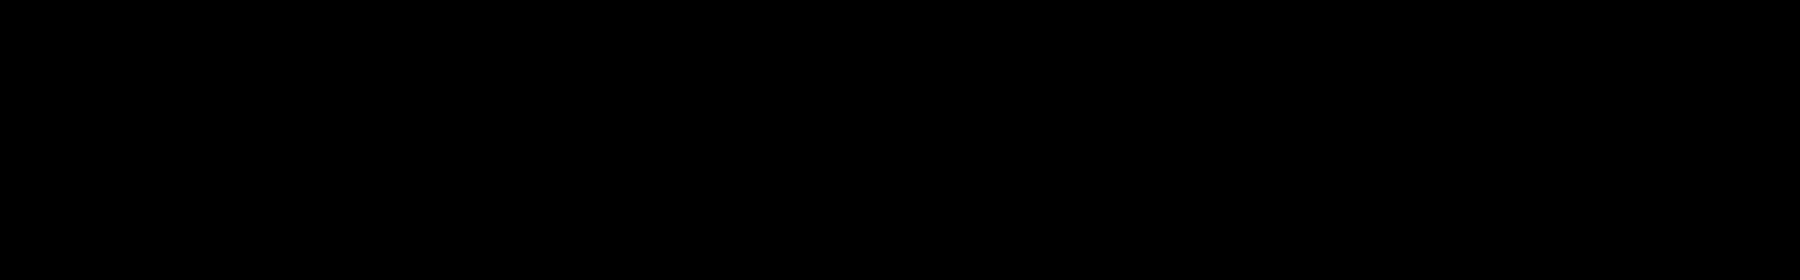 LO-FIRE audio waveform